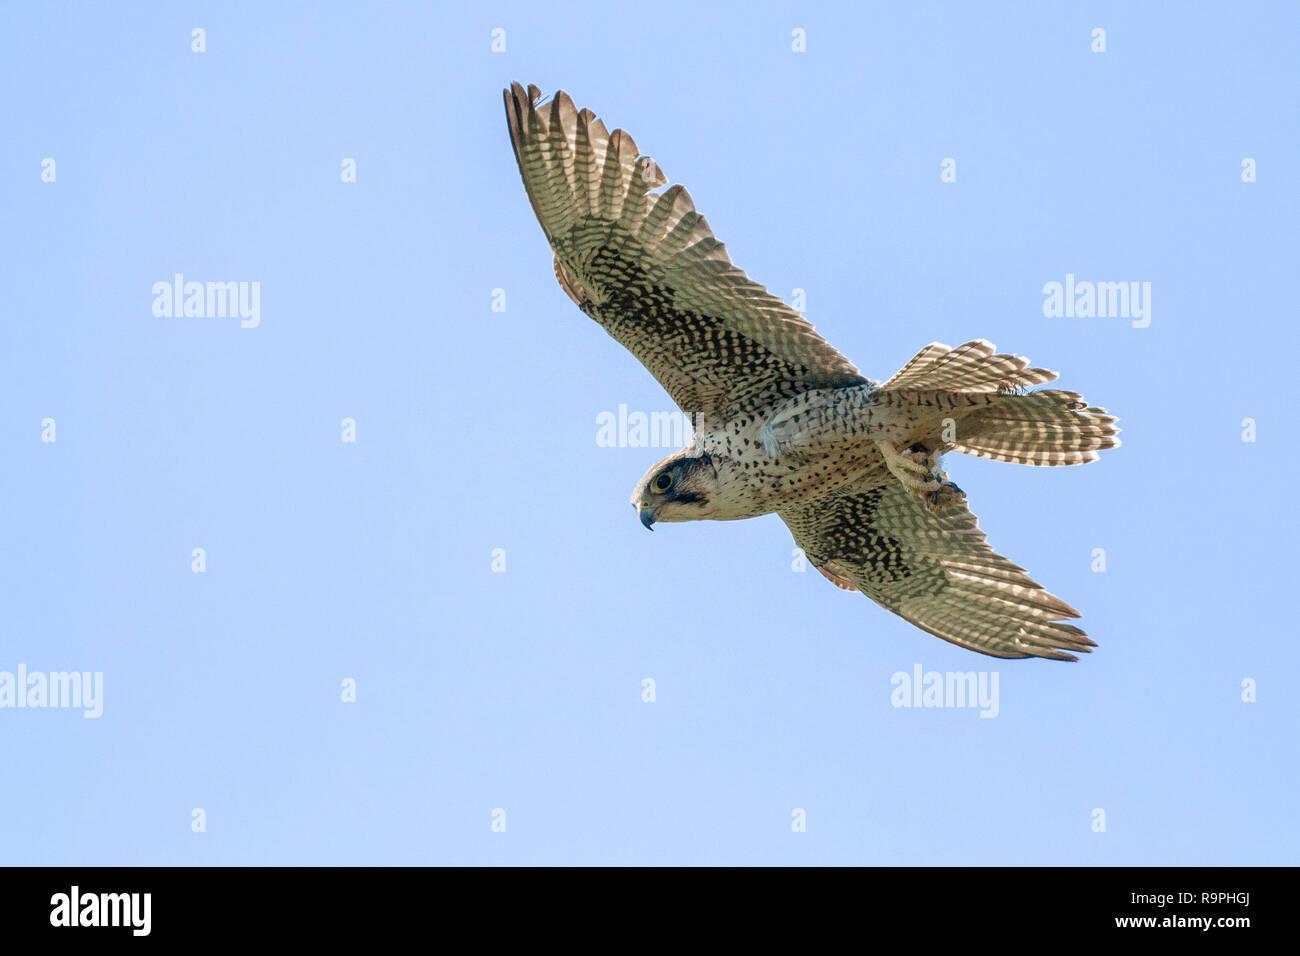 Lanner Falcon (Falco biarmicus feldeggi), adult in flight - Stock Image